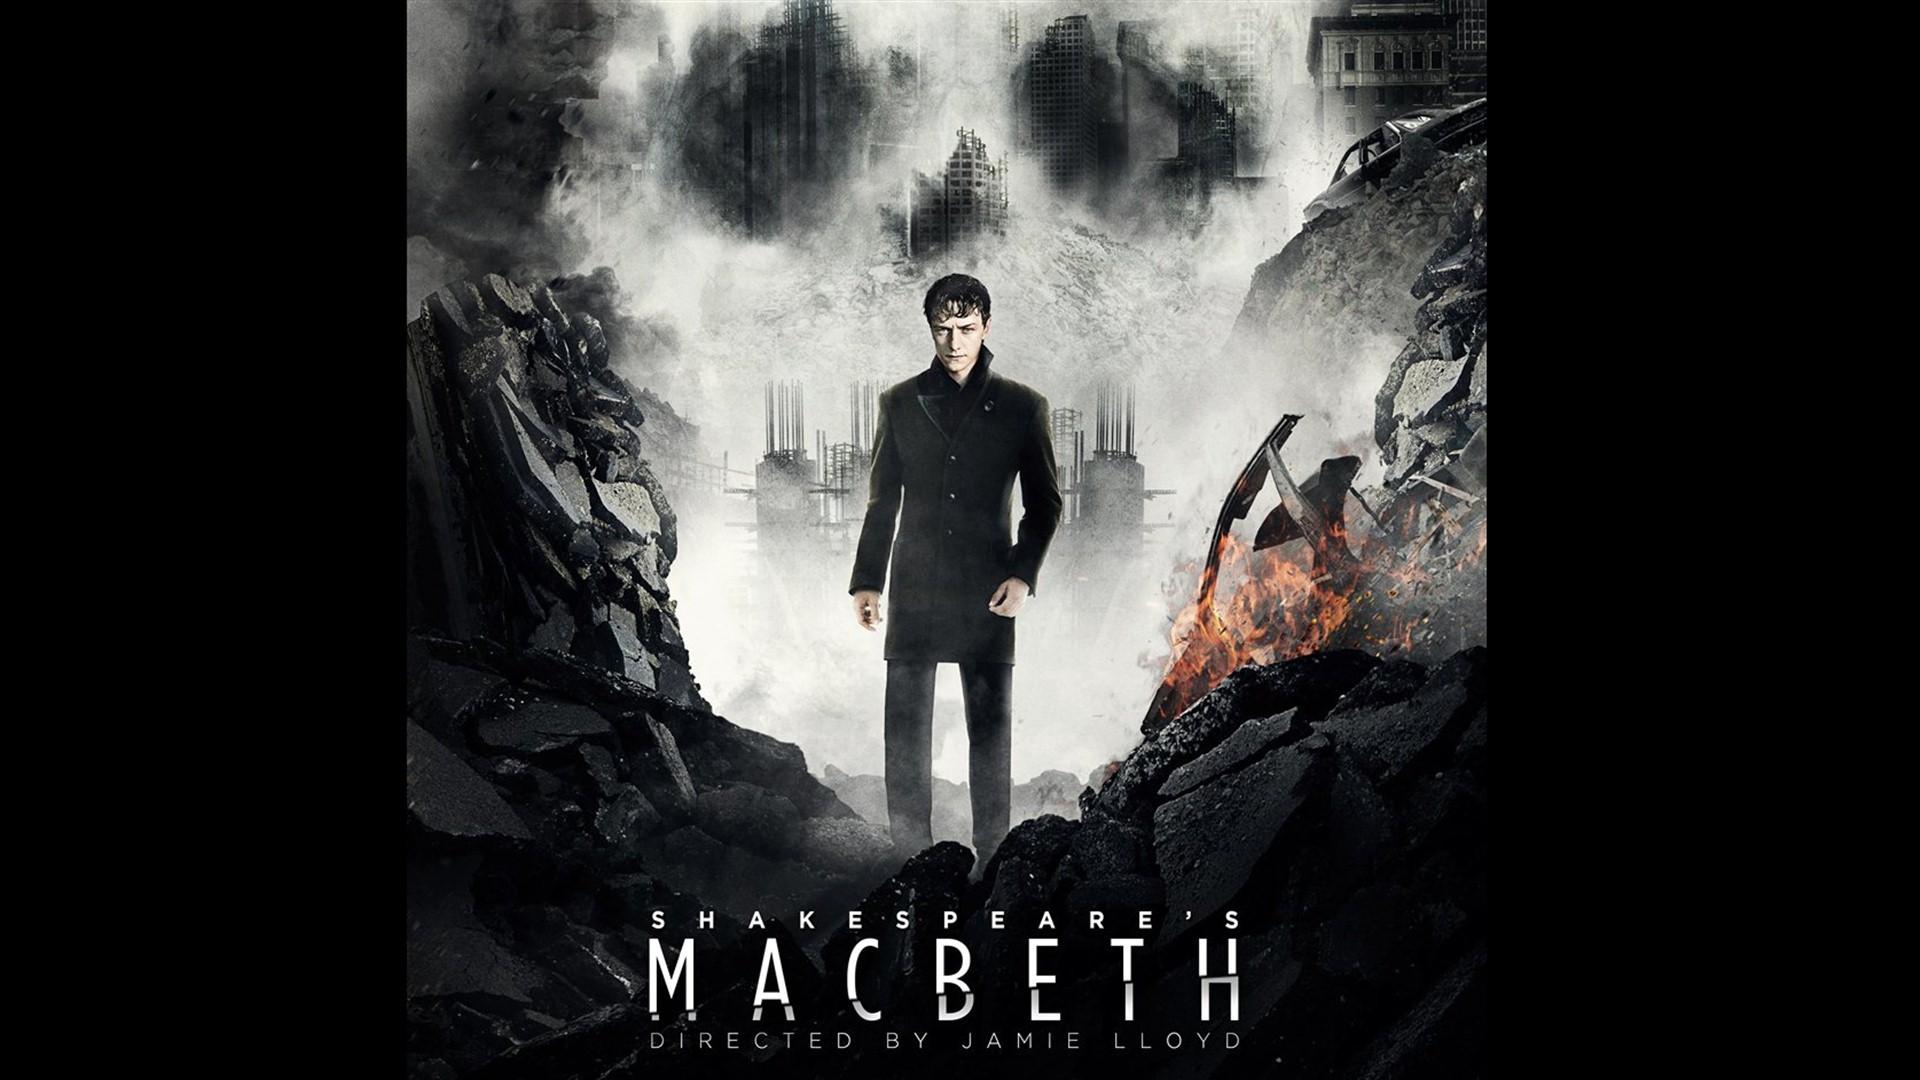 Macbeth Wallpapers 59 Images